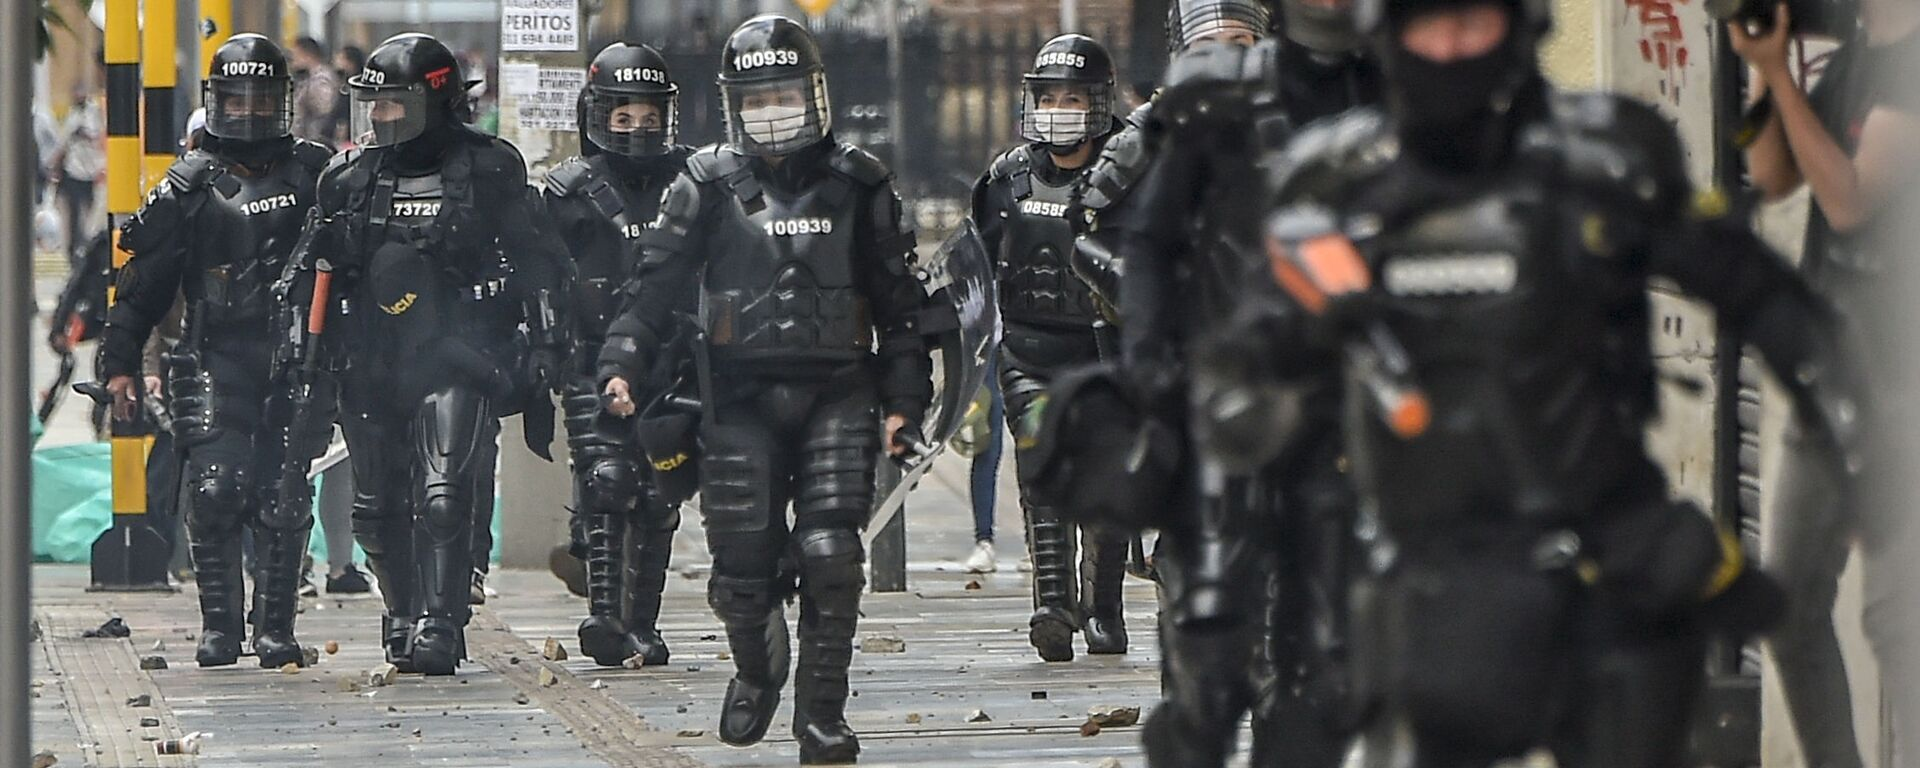 Policía antidisturbios en Bogotá, Colombia - Sputnik Mundo, 1920, 19.07.2021